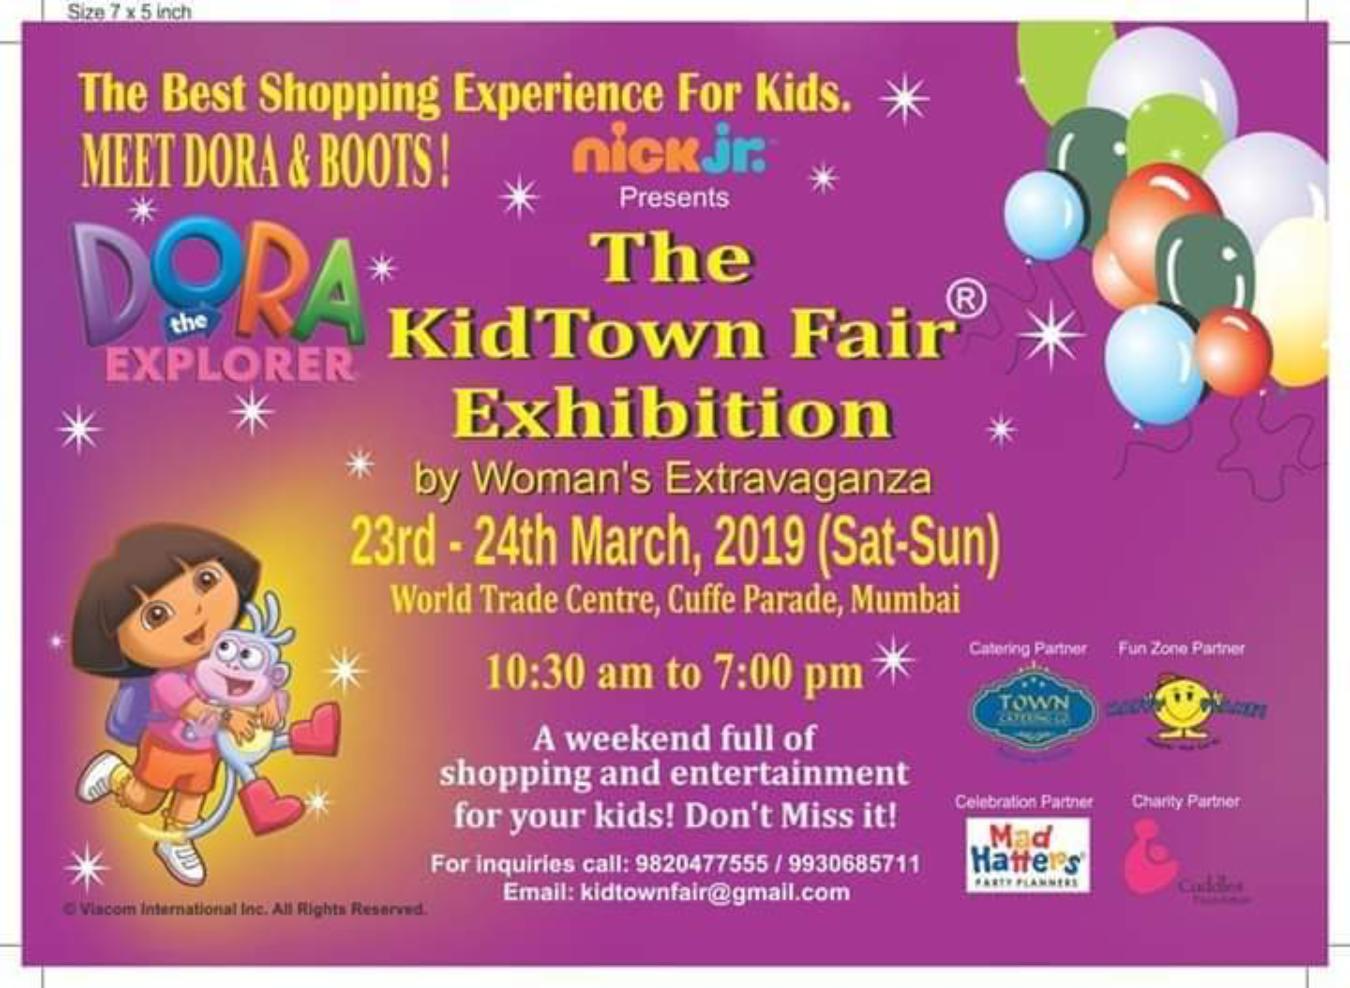 The KidTown Fair Exhibition